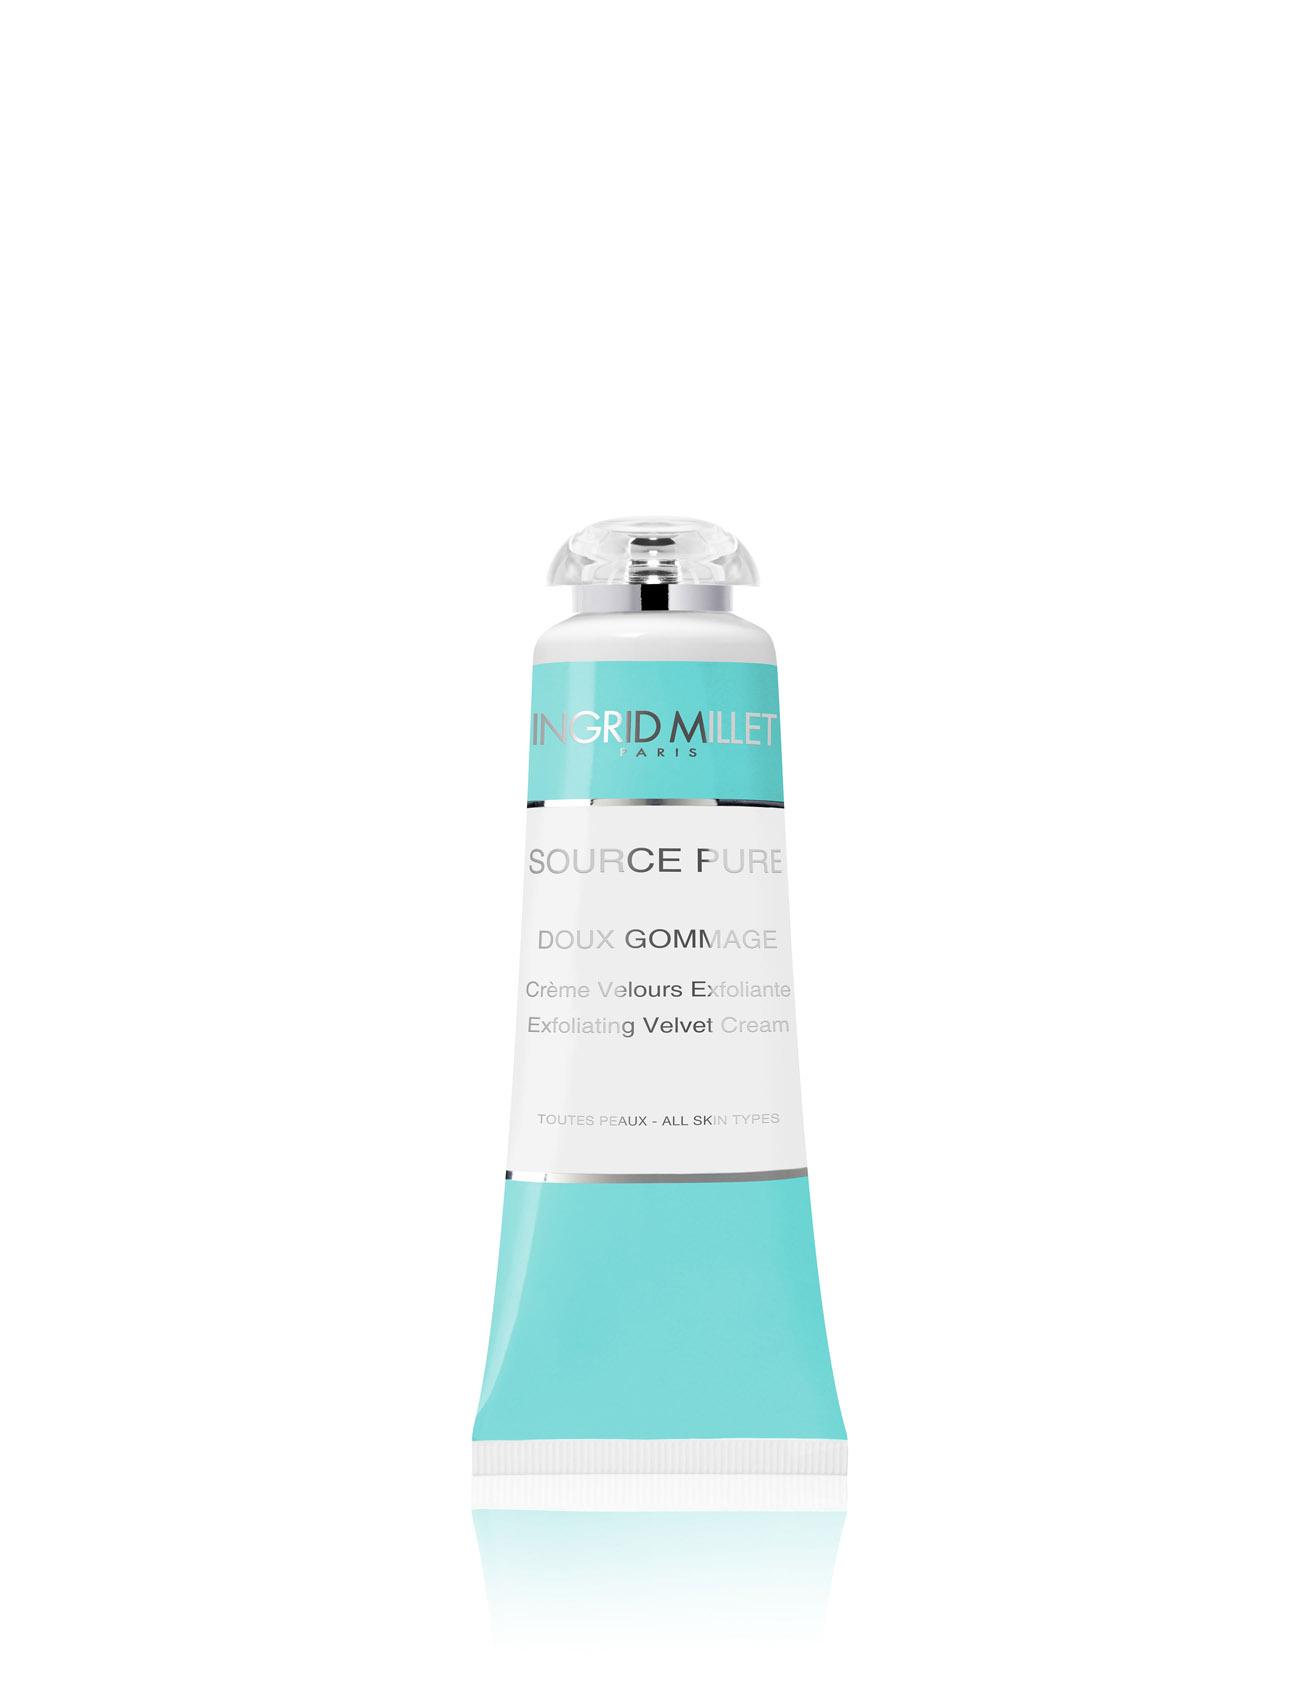 1-Doux-Gommage-Crema-esfoliante-vellutata-Ingrid-Millet-Linea-cosmetici-di-lusso-Source-Pure-Dispar-SpA copia.jpg